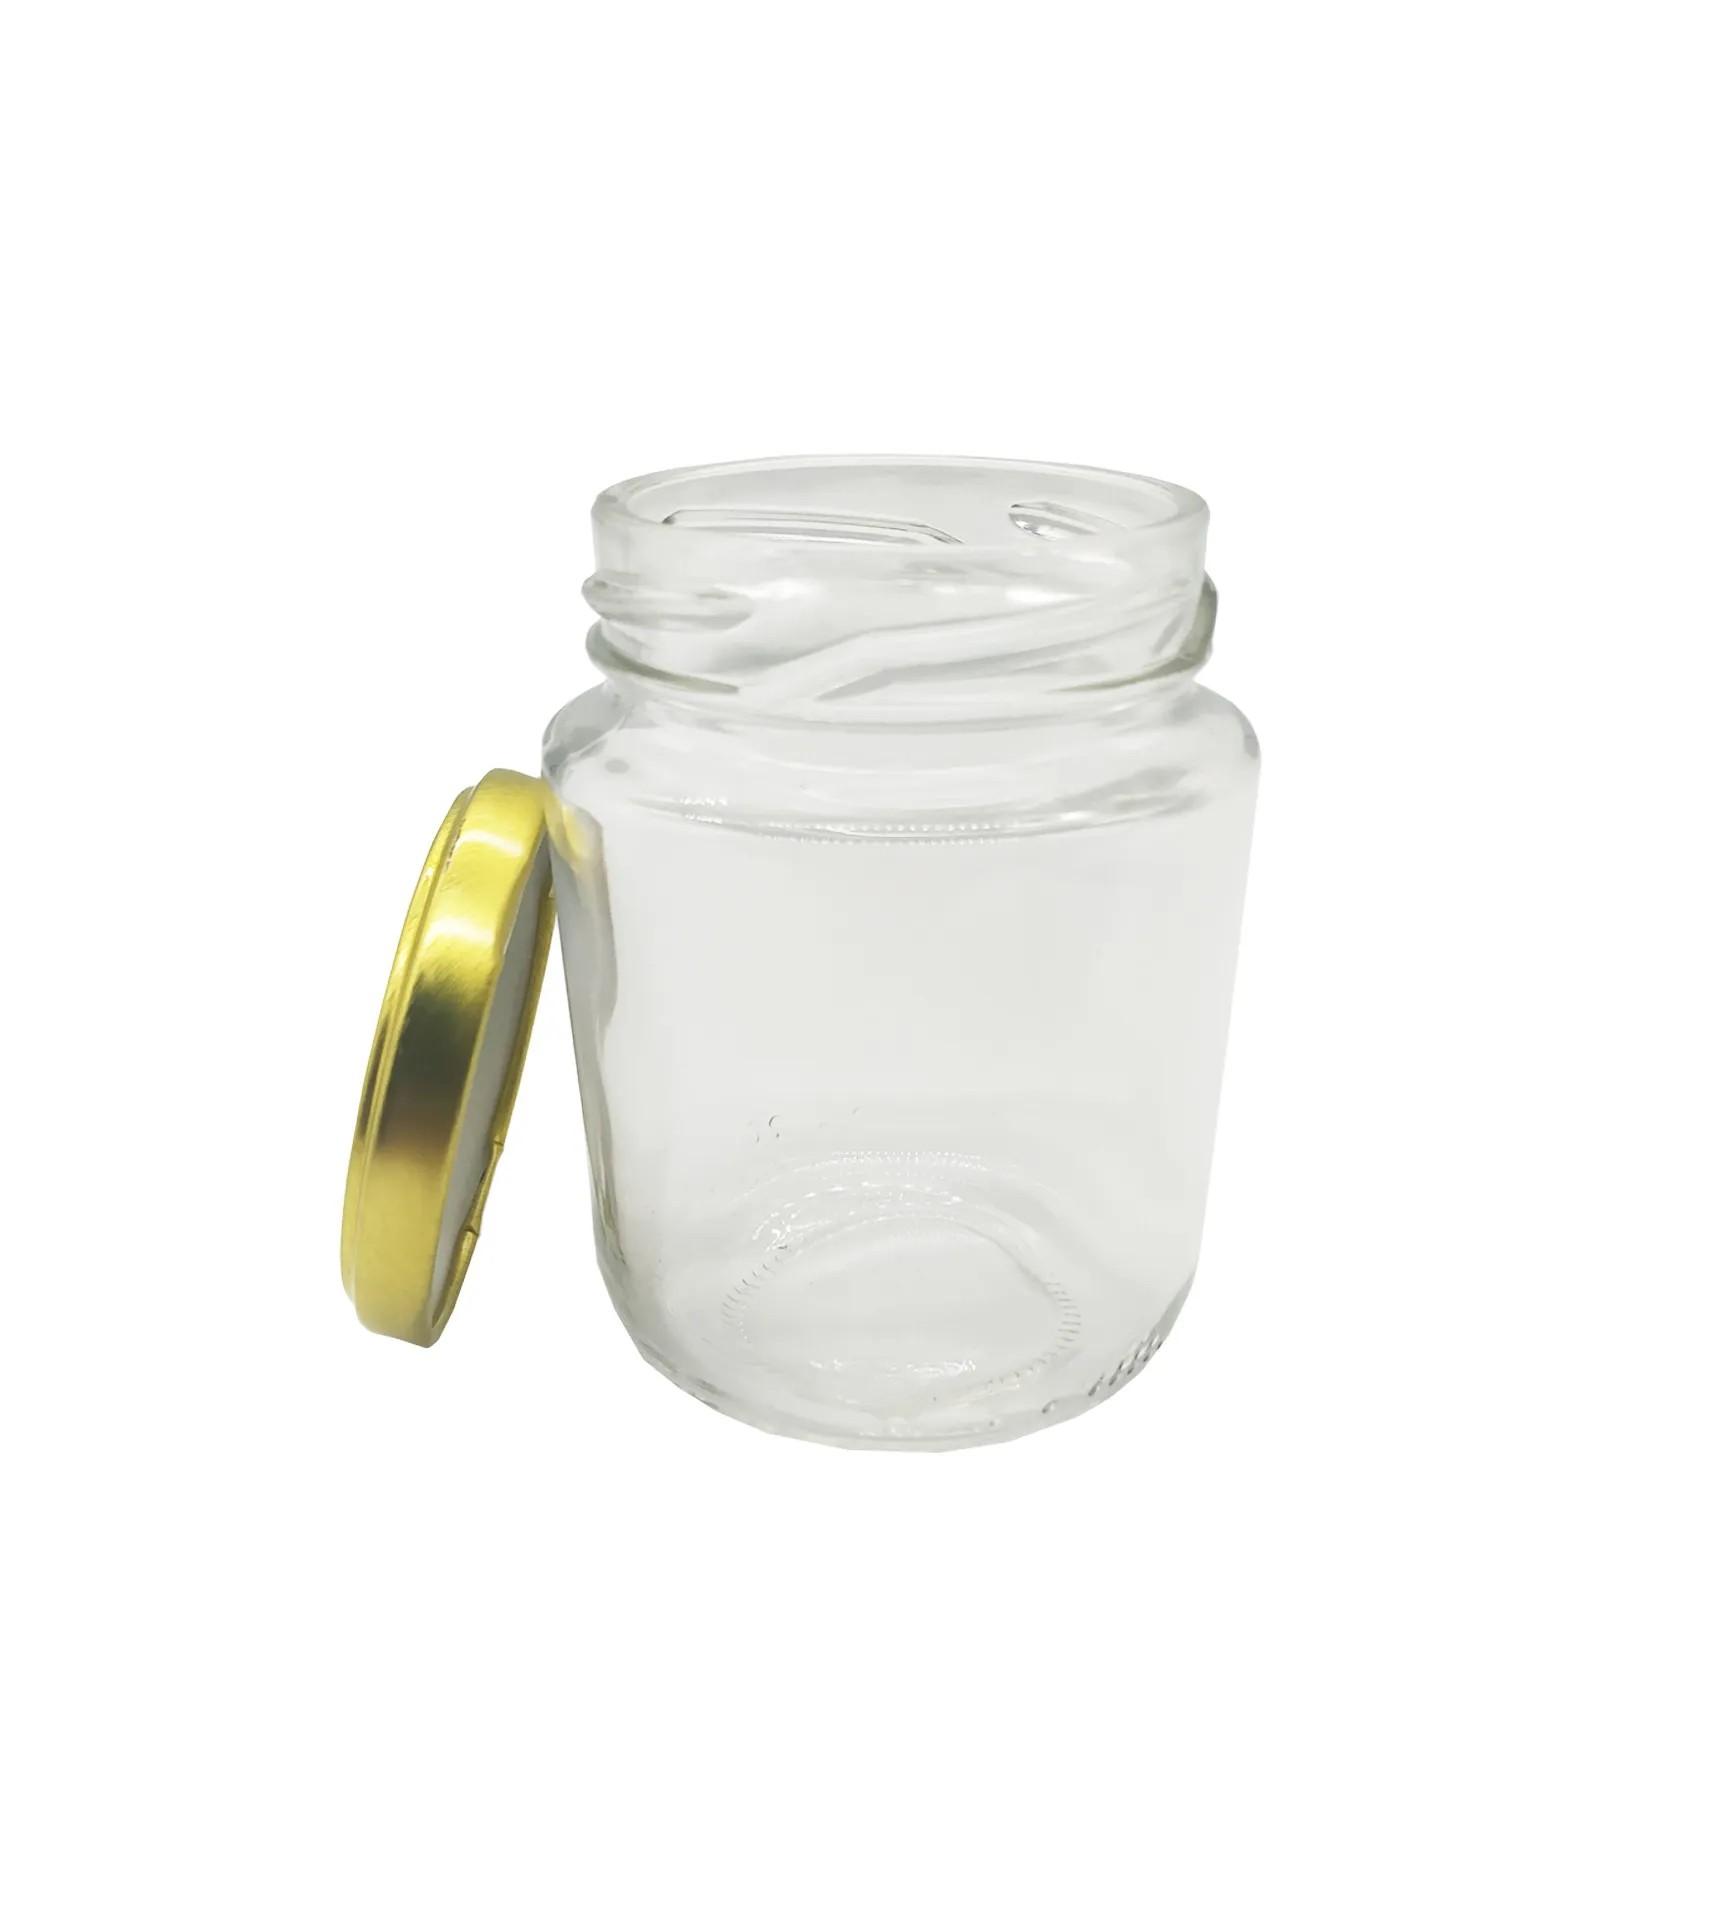 Pote vidro 240ml com cx 24 unidades